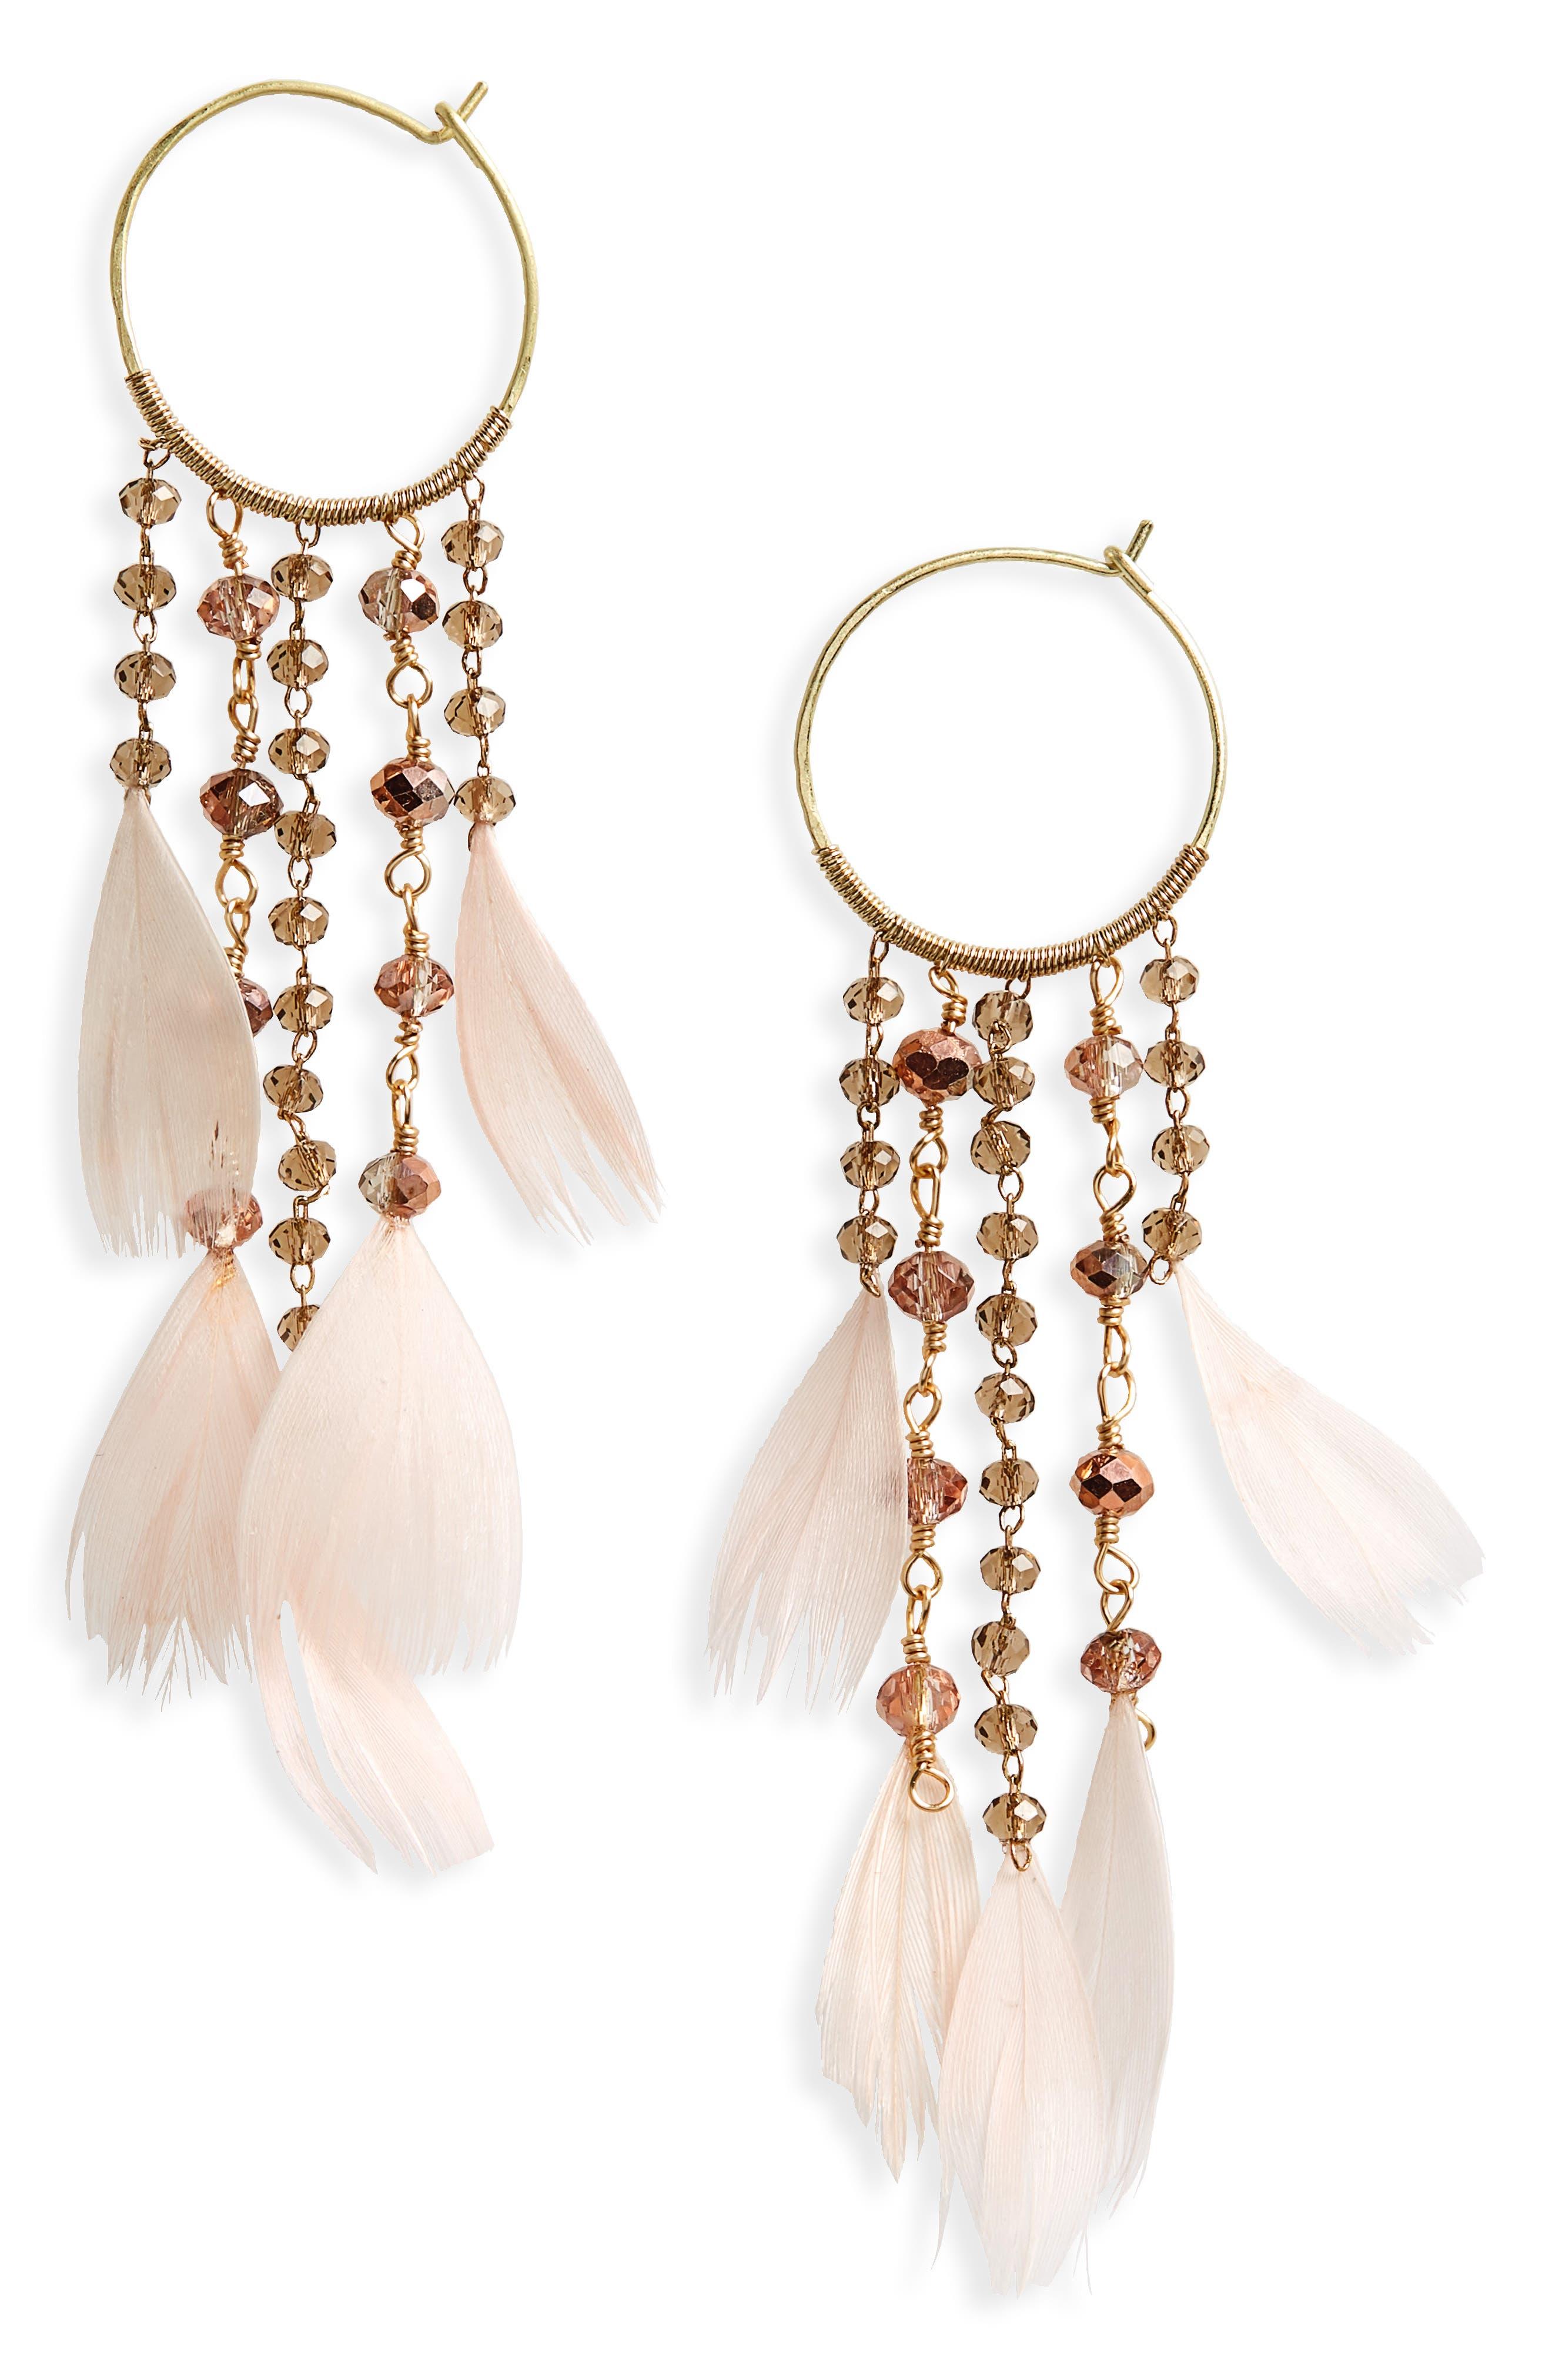 Cascading Crystal & Feather Hoop Earrings,                             Main thumbnail 1, color,